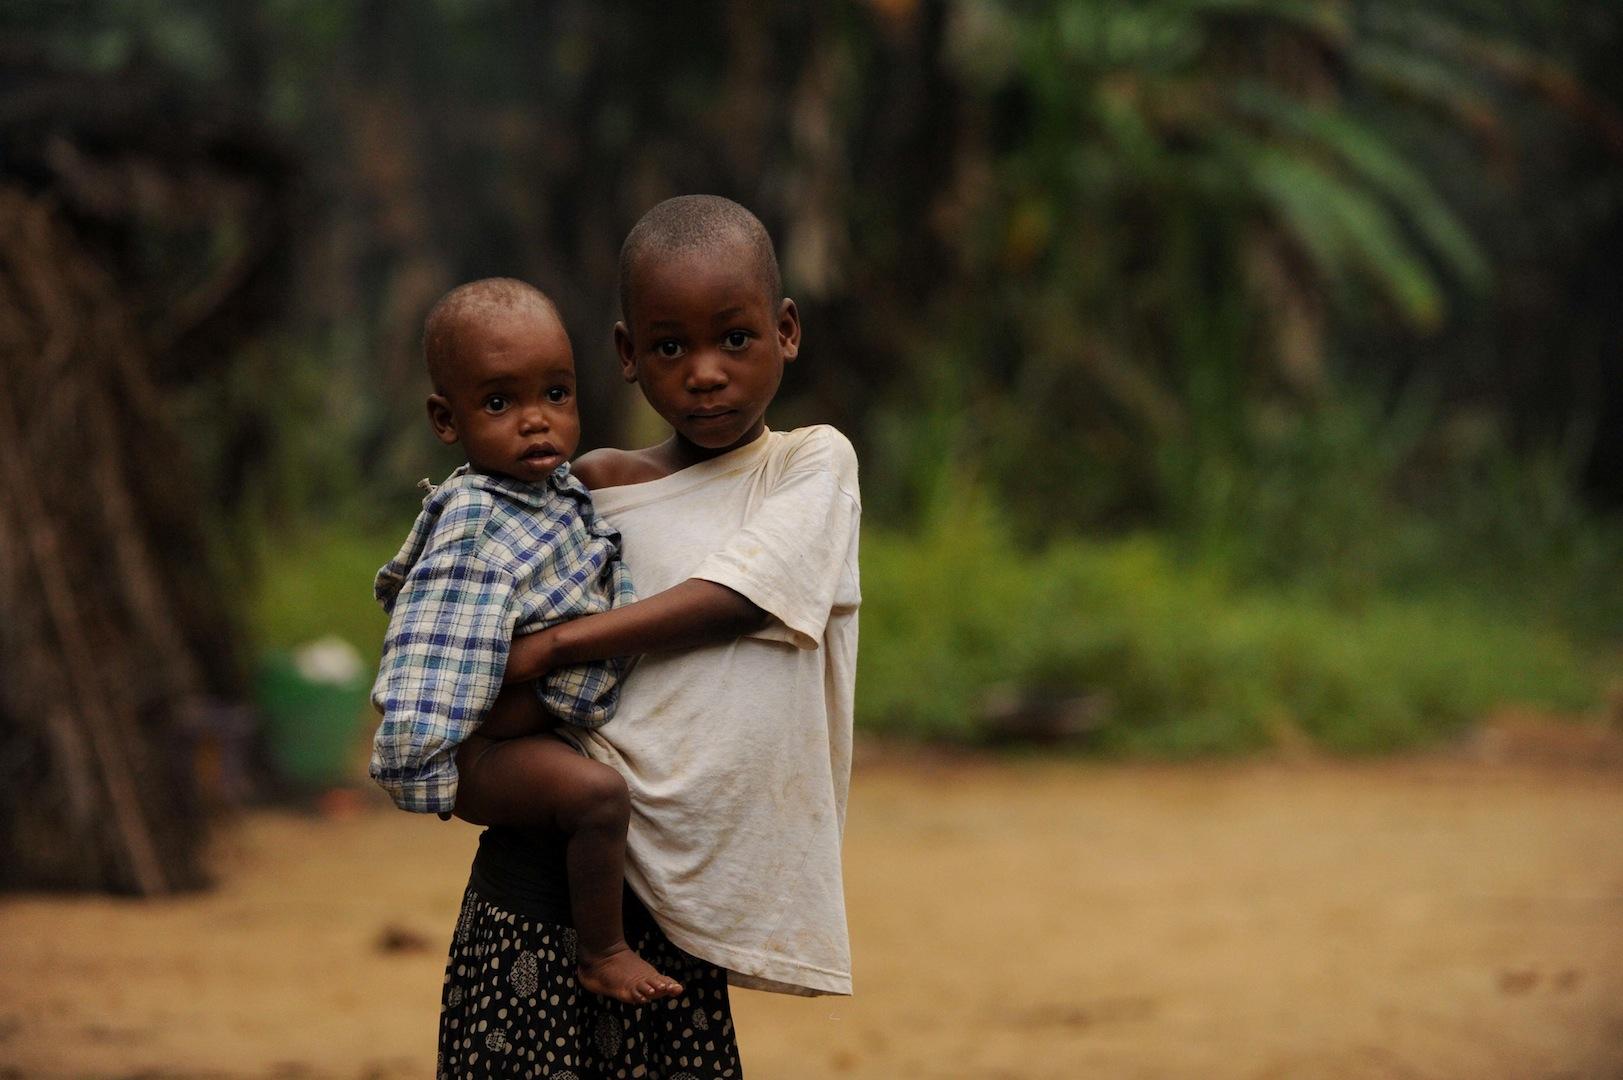 CAMEROON 021